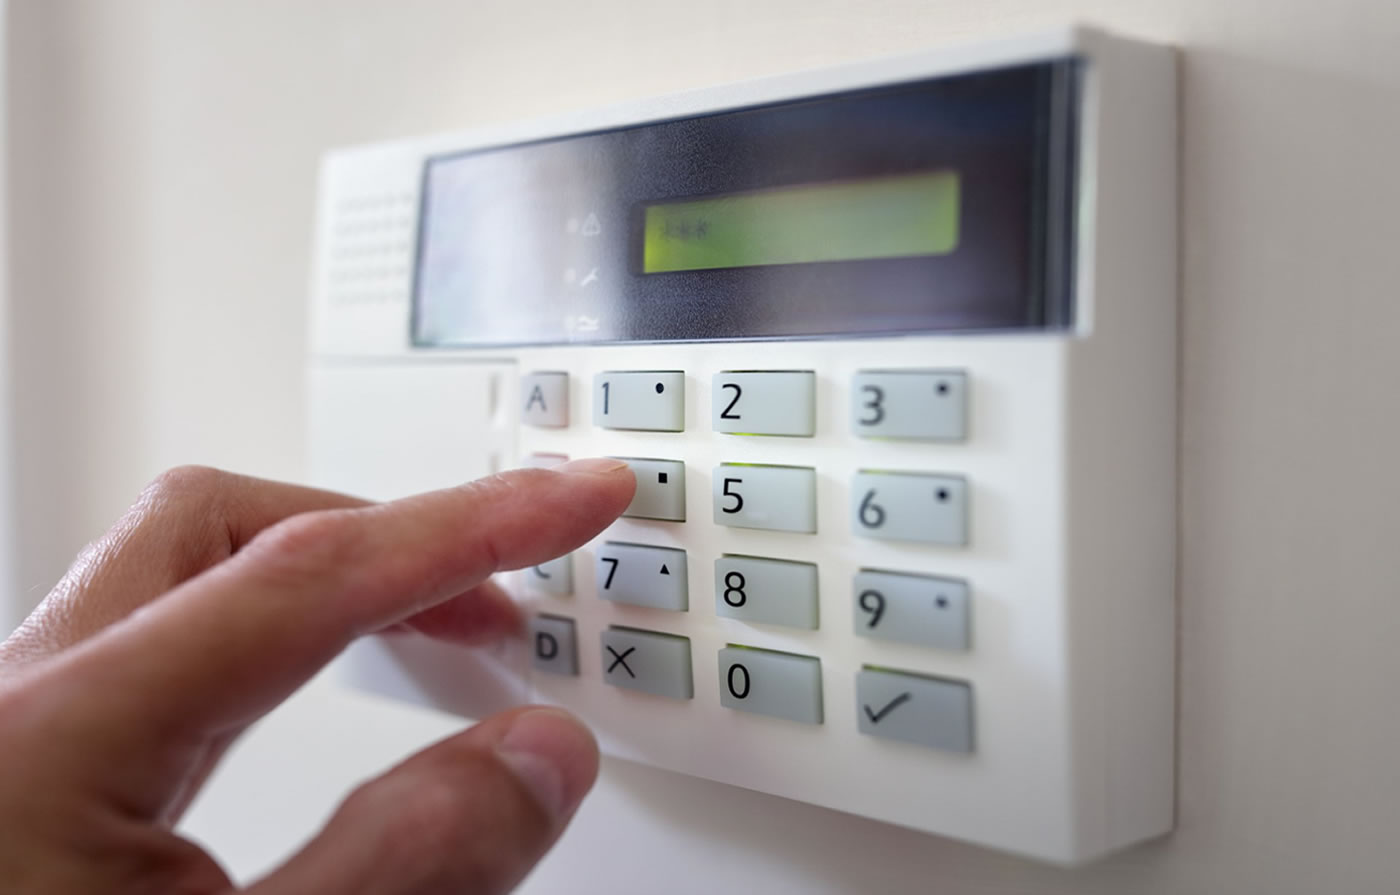 False alarm keypad